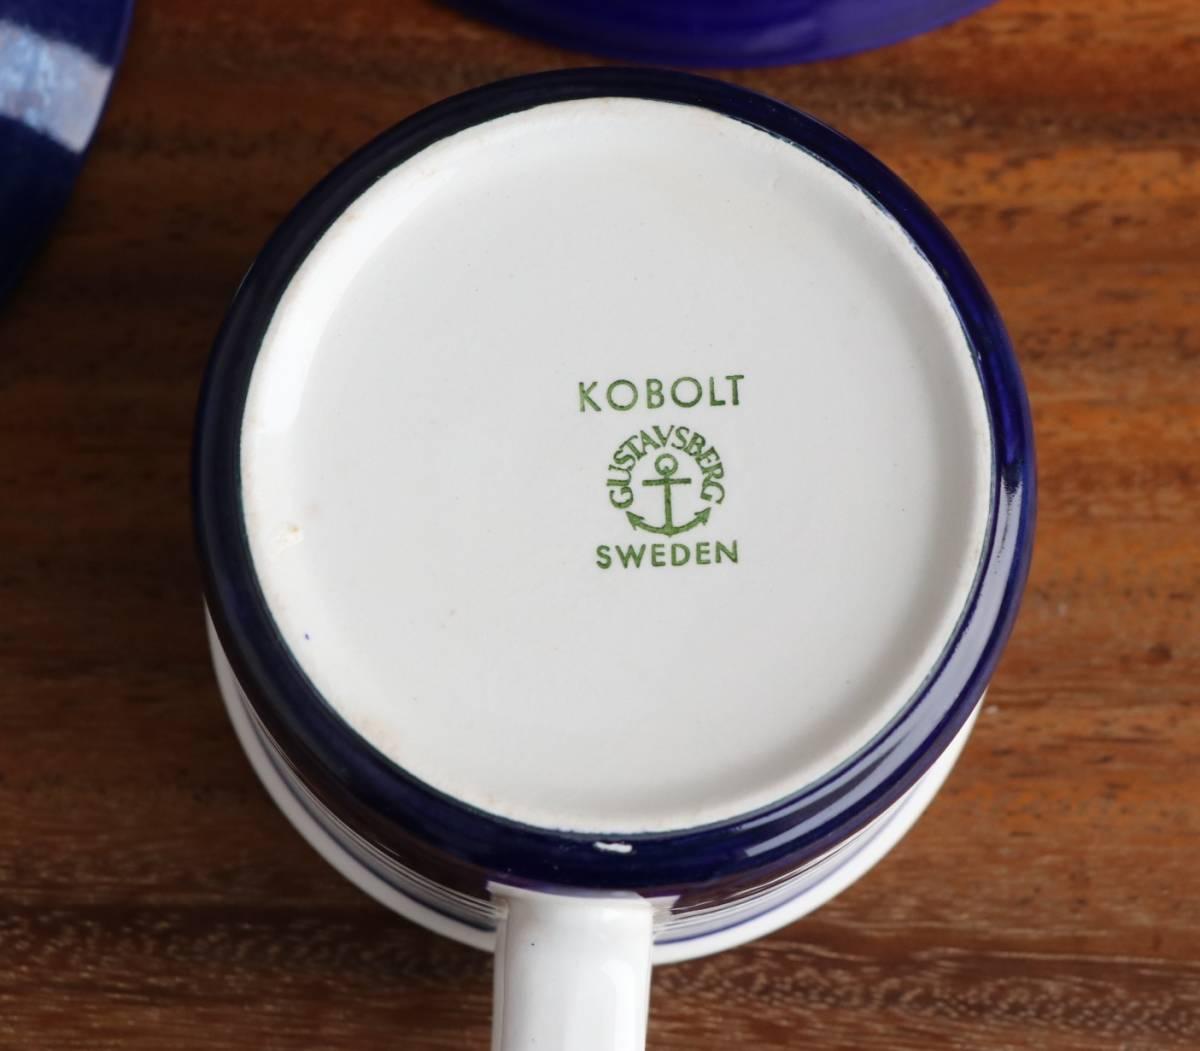 KOBOLT Karin Bjorquist カップ&ソーサーとプレート 北欧ヴィンテージ Gustavsberg グスタフスベリ_画像8